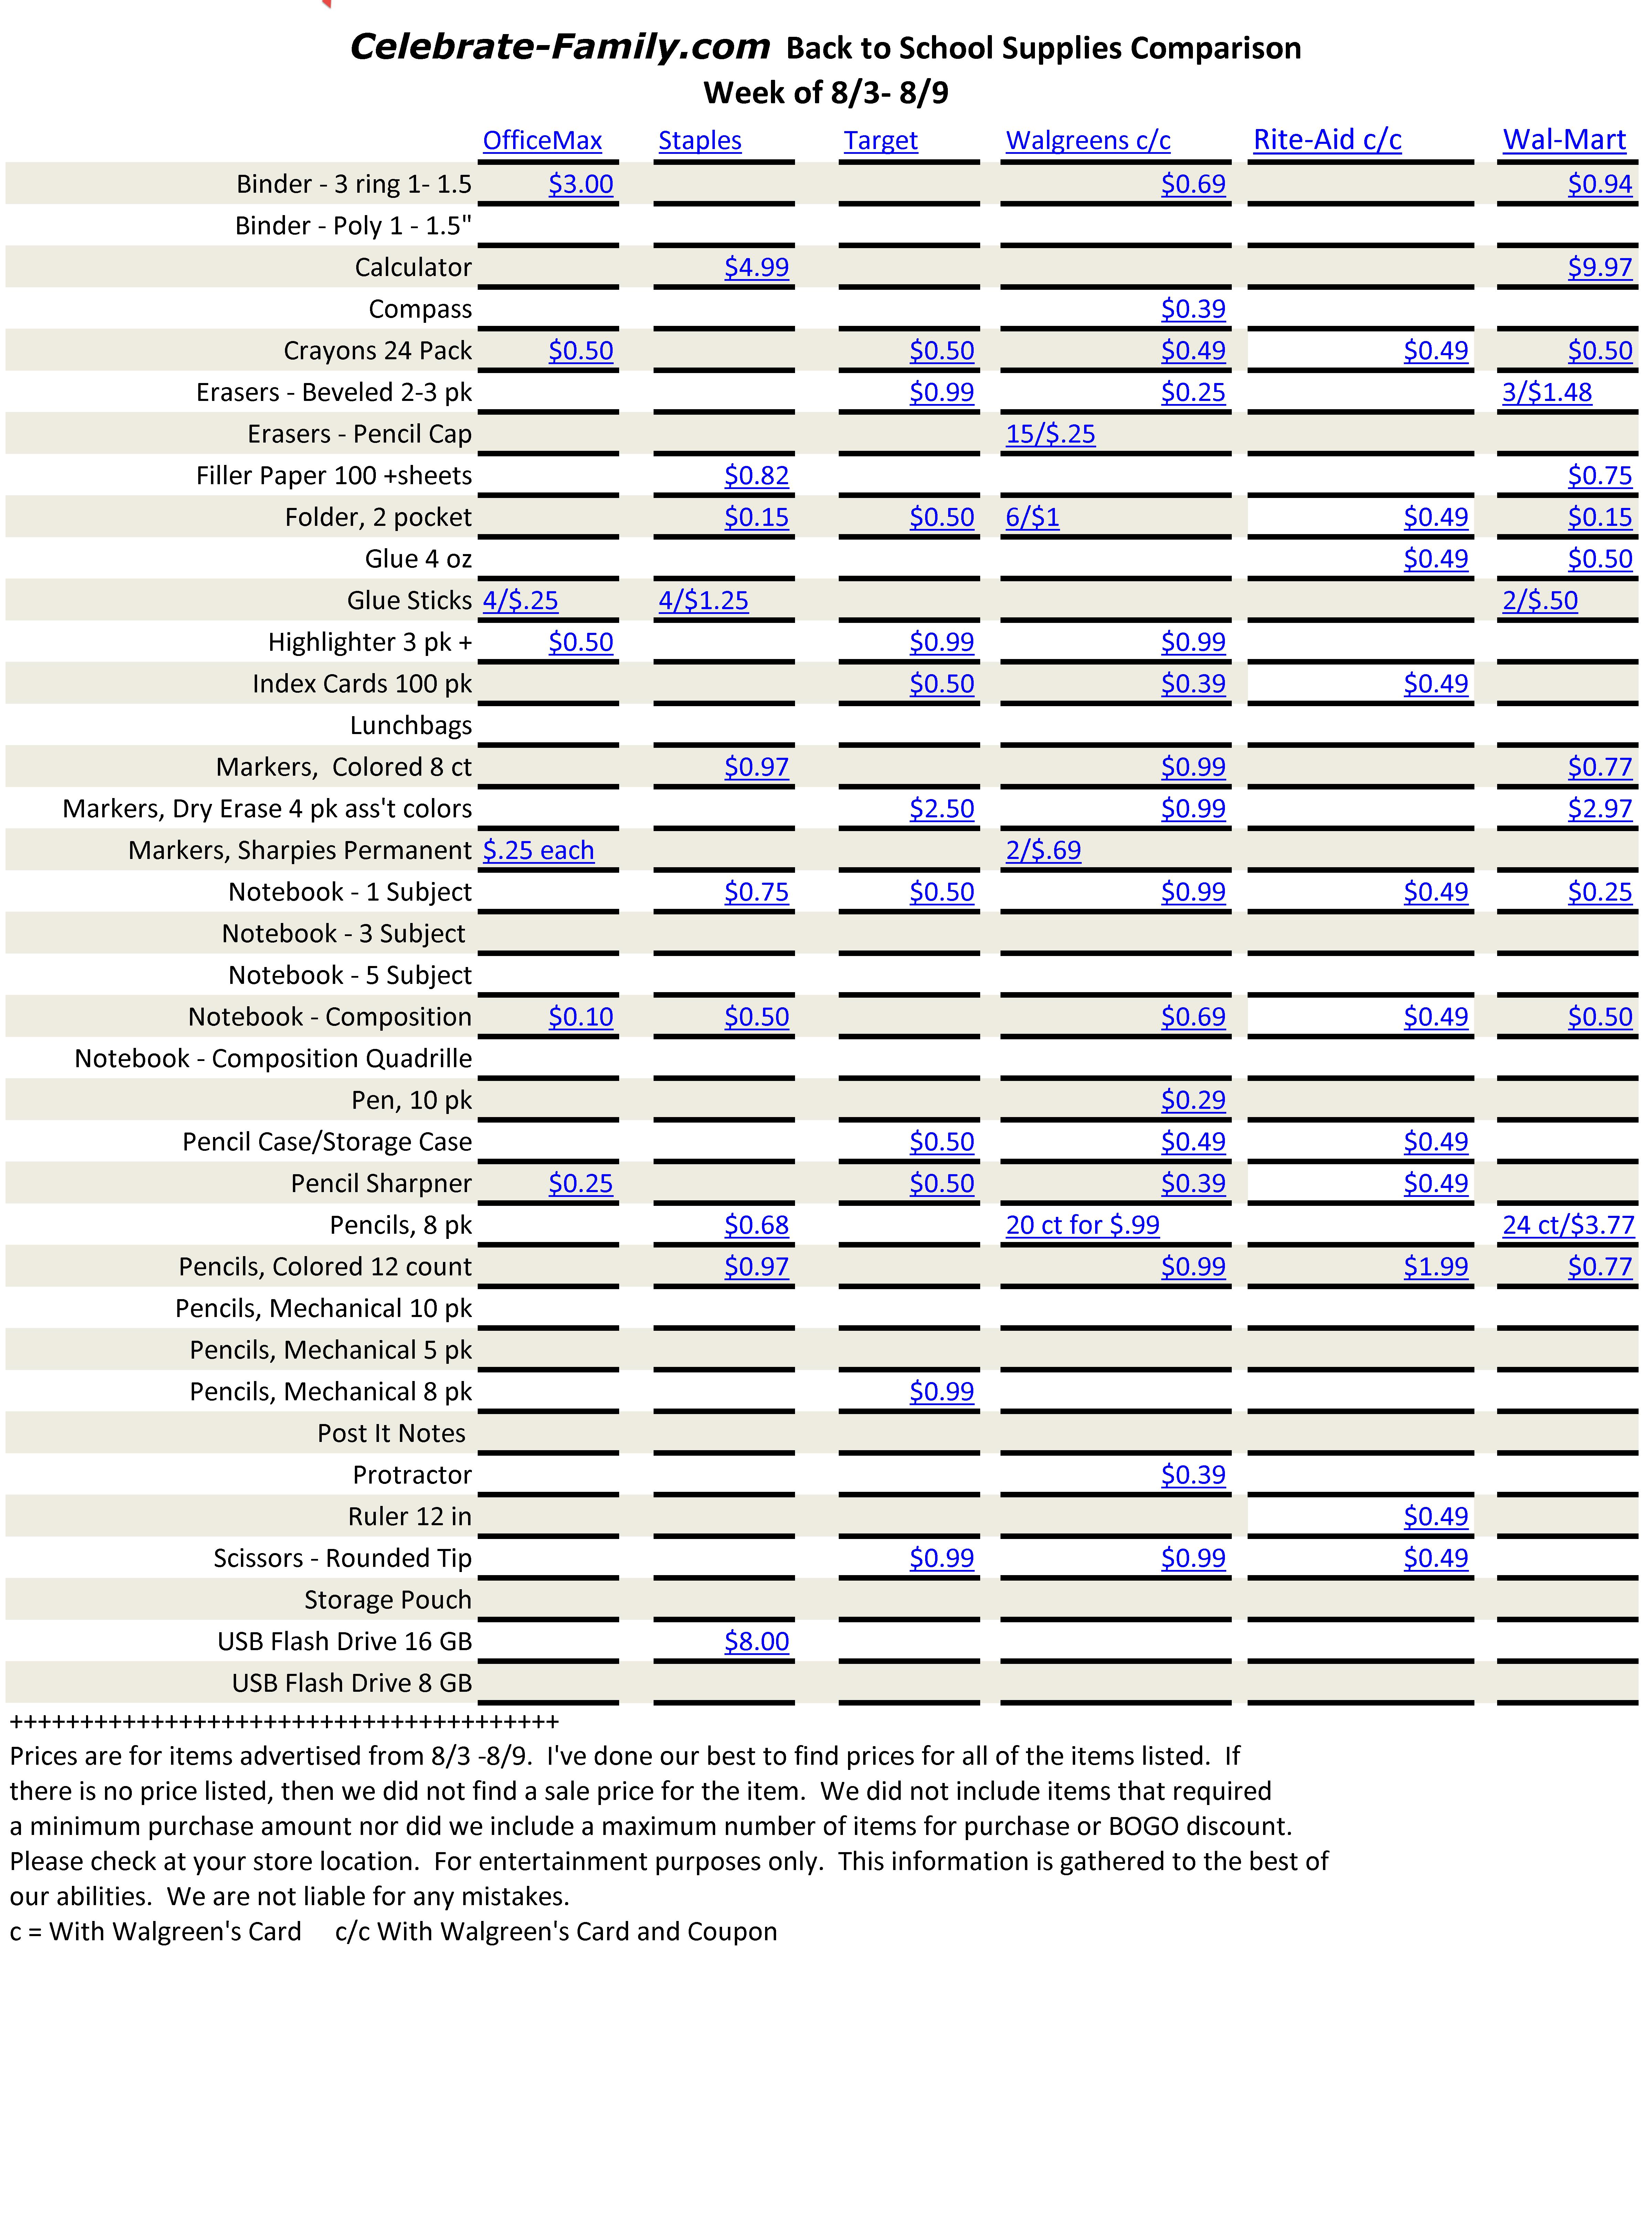 back-to-school-discounts-20140803